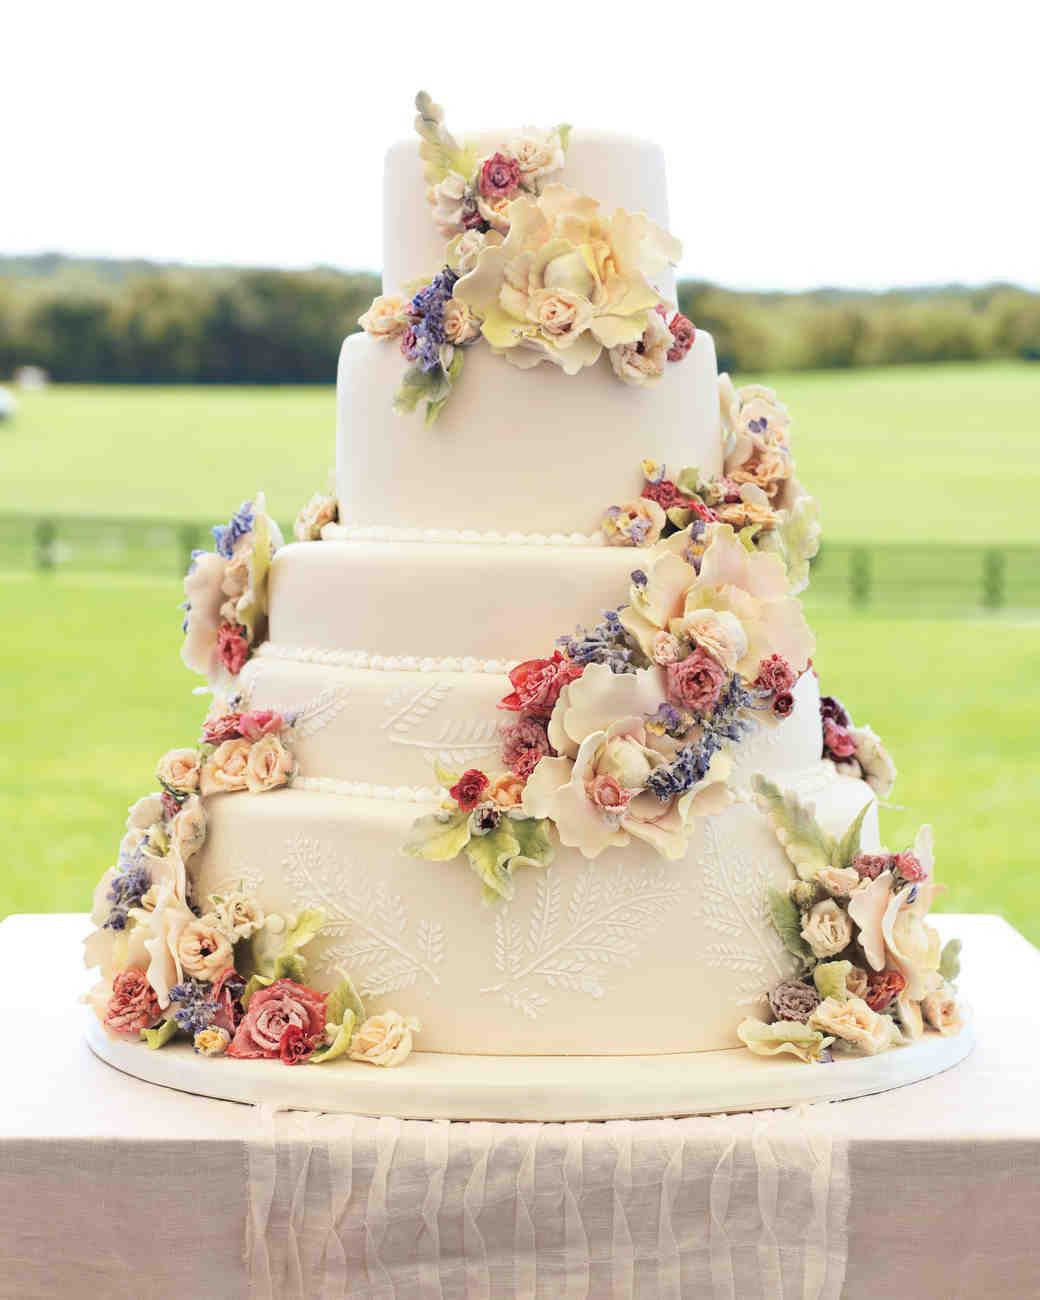 kennedy-gregory-cakes-016-mwd108943.jpg